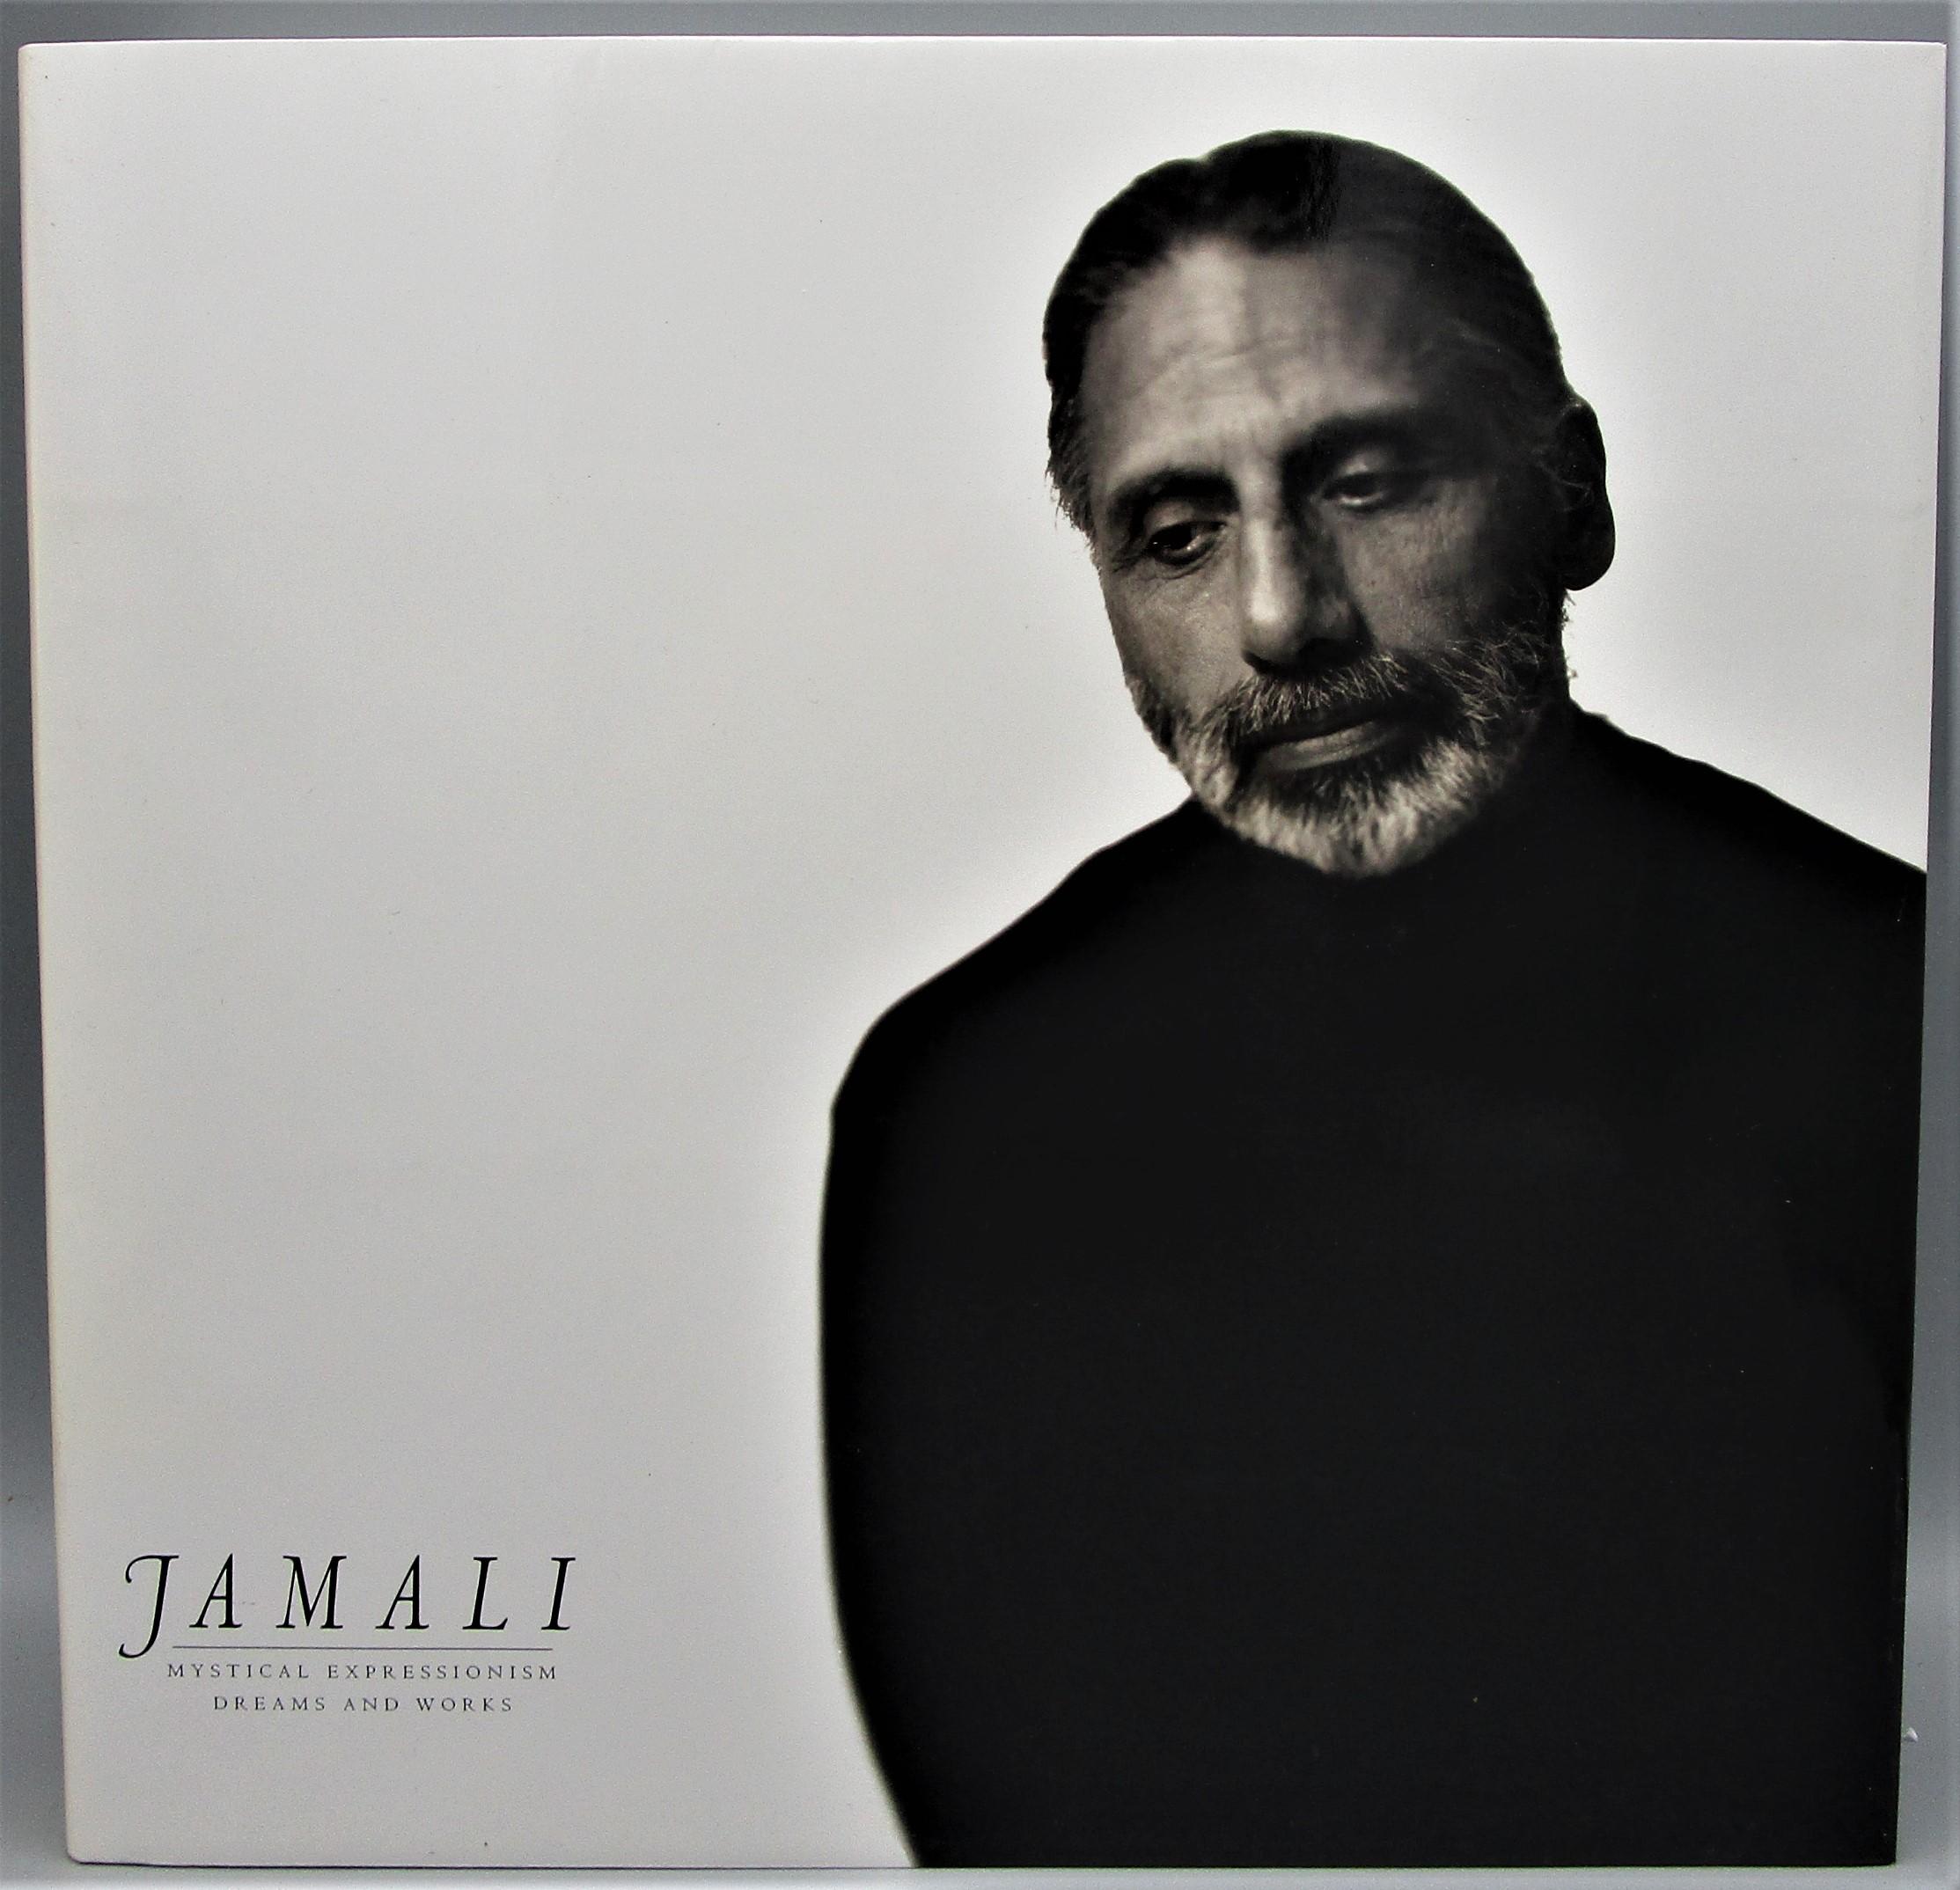 JAMALI: MYSTICAL EXPRESSIONISM, DREAMS & WORKS - 2003 [2 Vols]